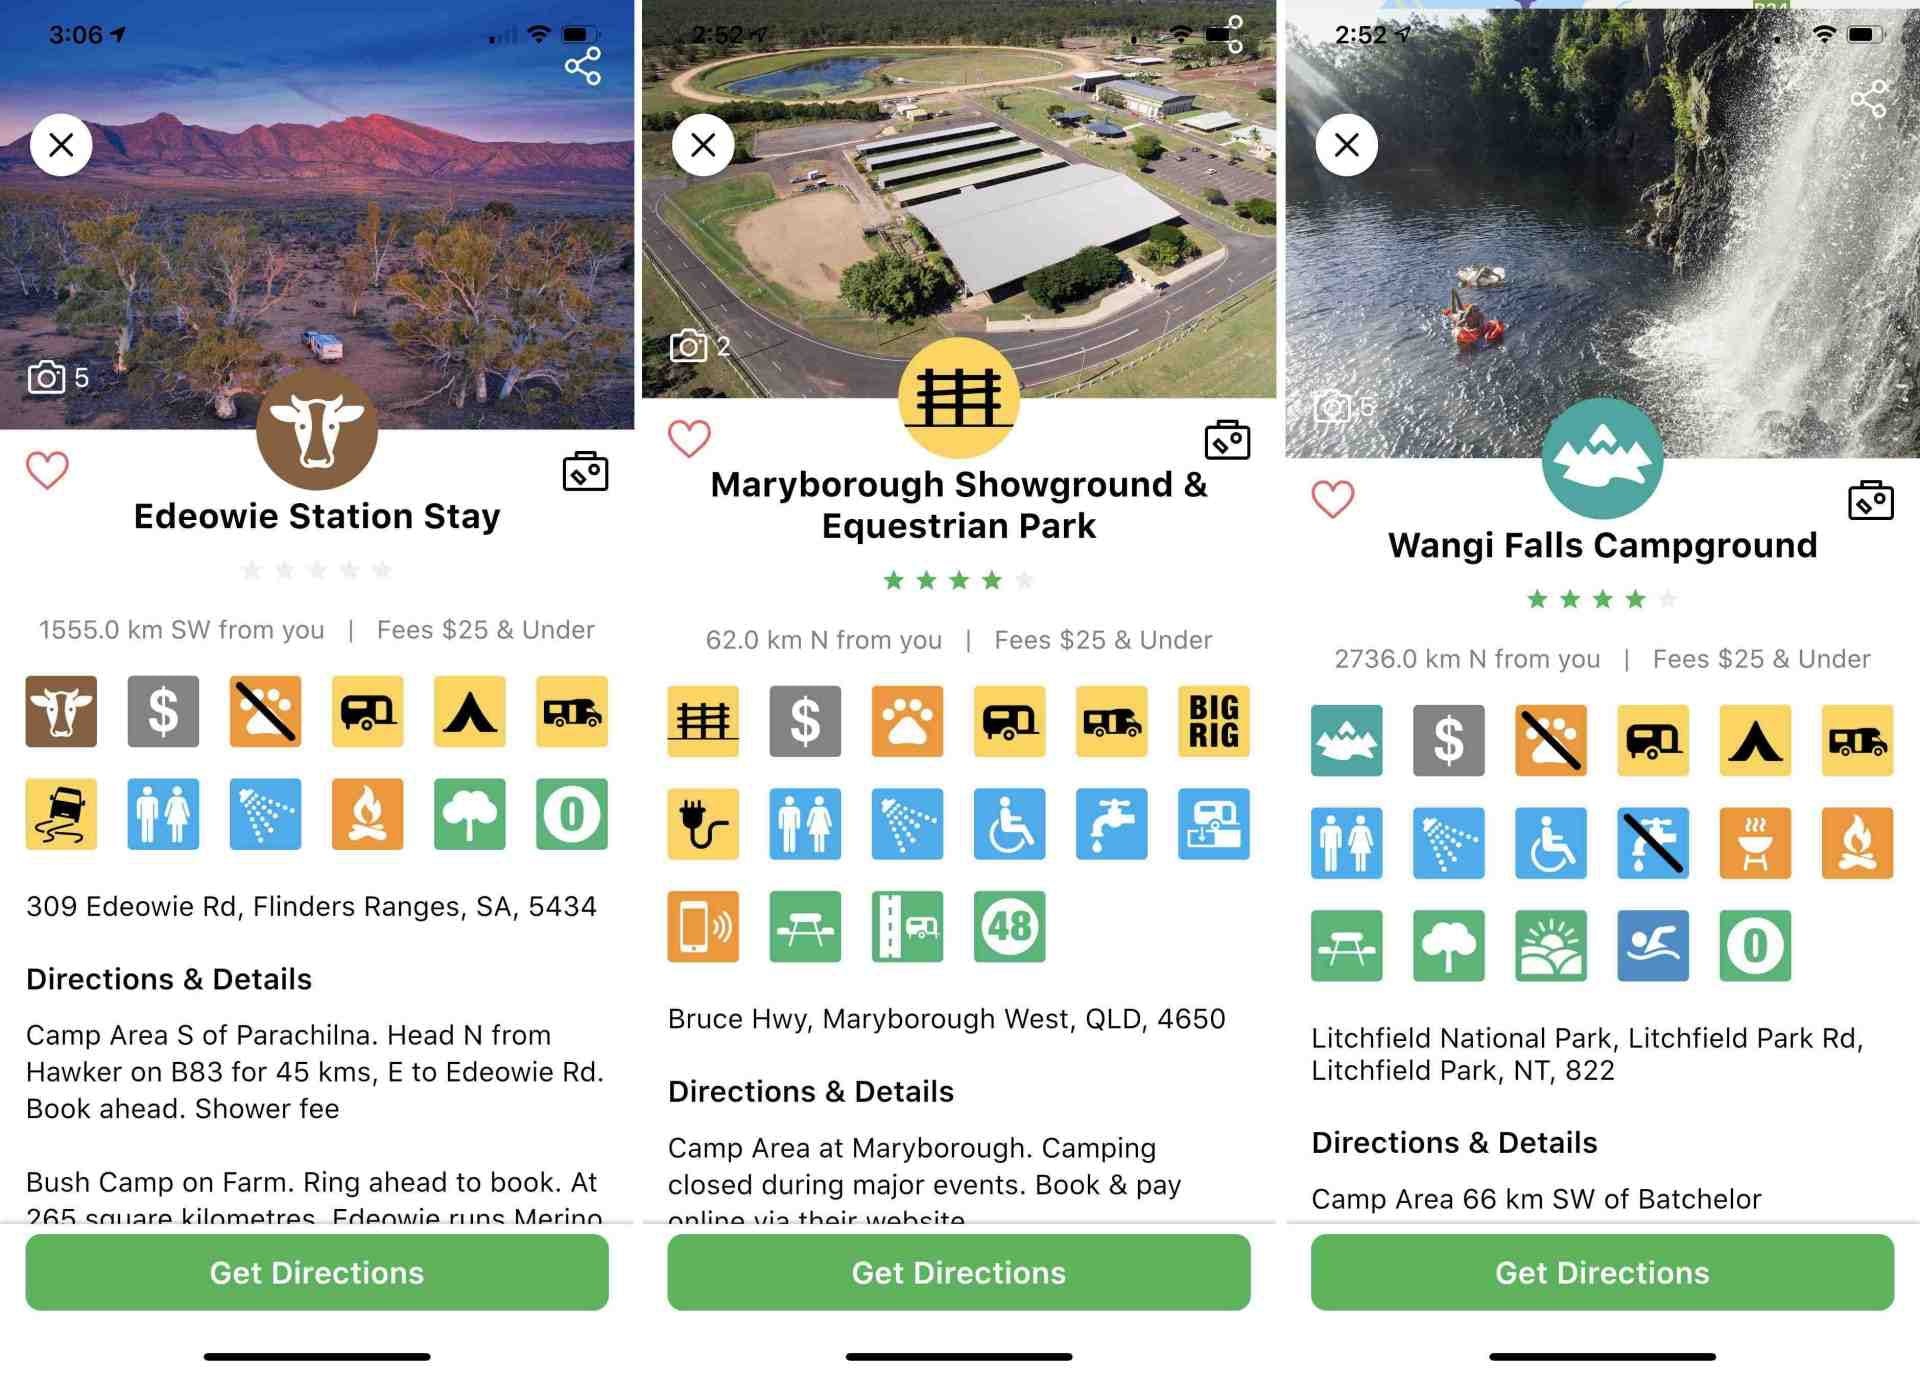 Camps Australia Wide App V4.0 - Edowie Station Stay, Maryborough Showground, Wangi Falls